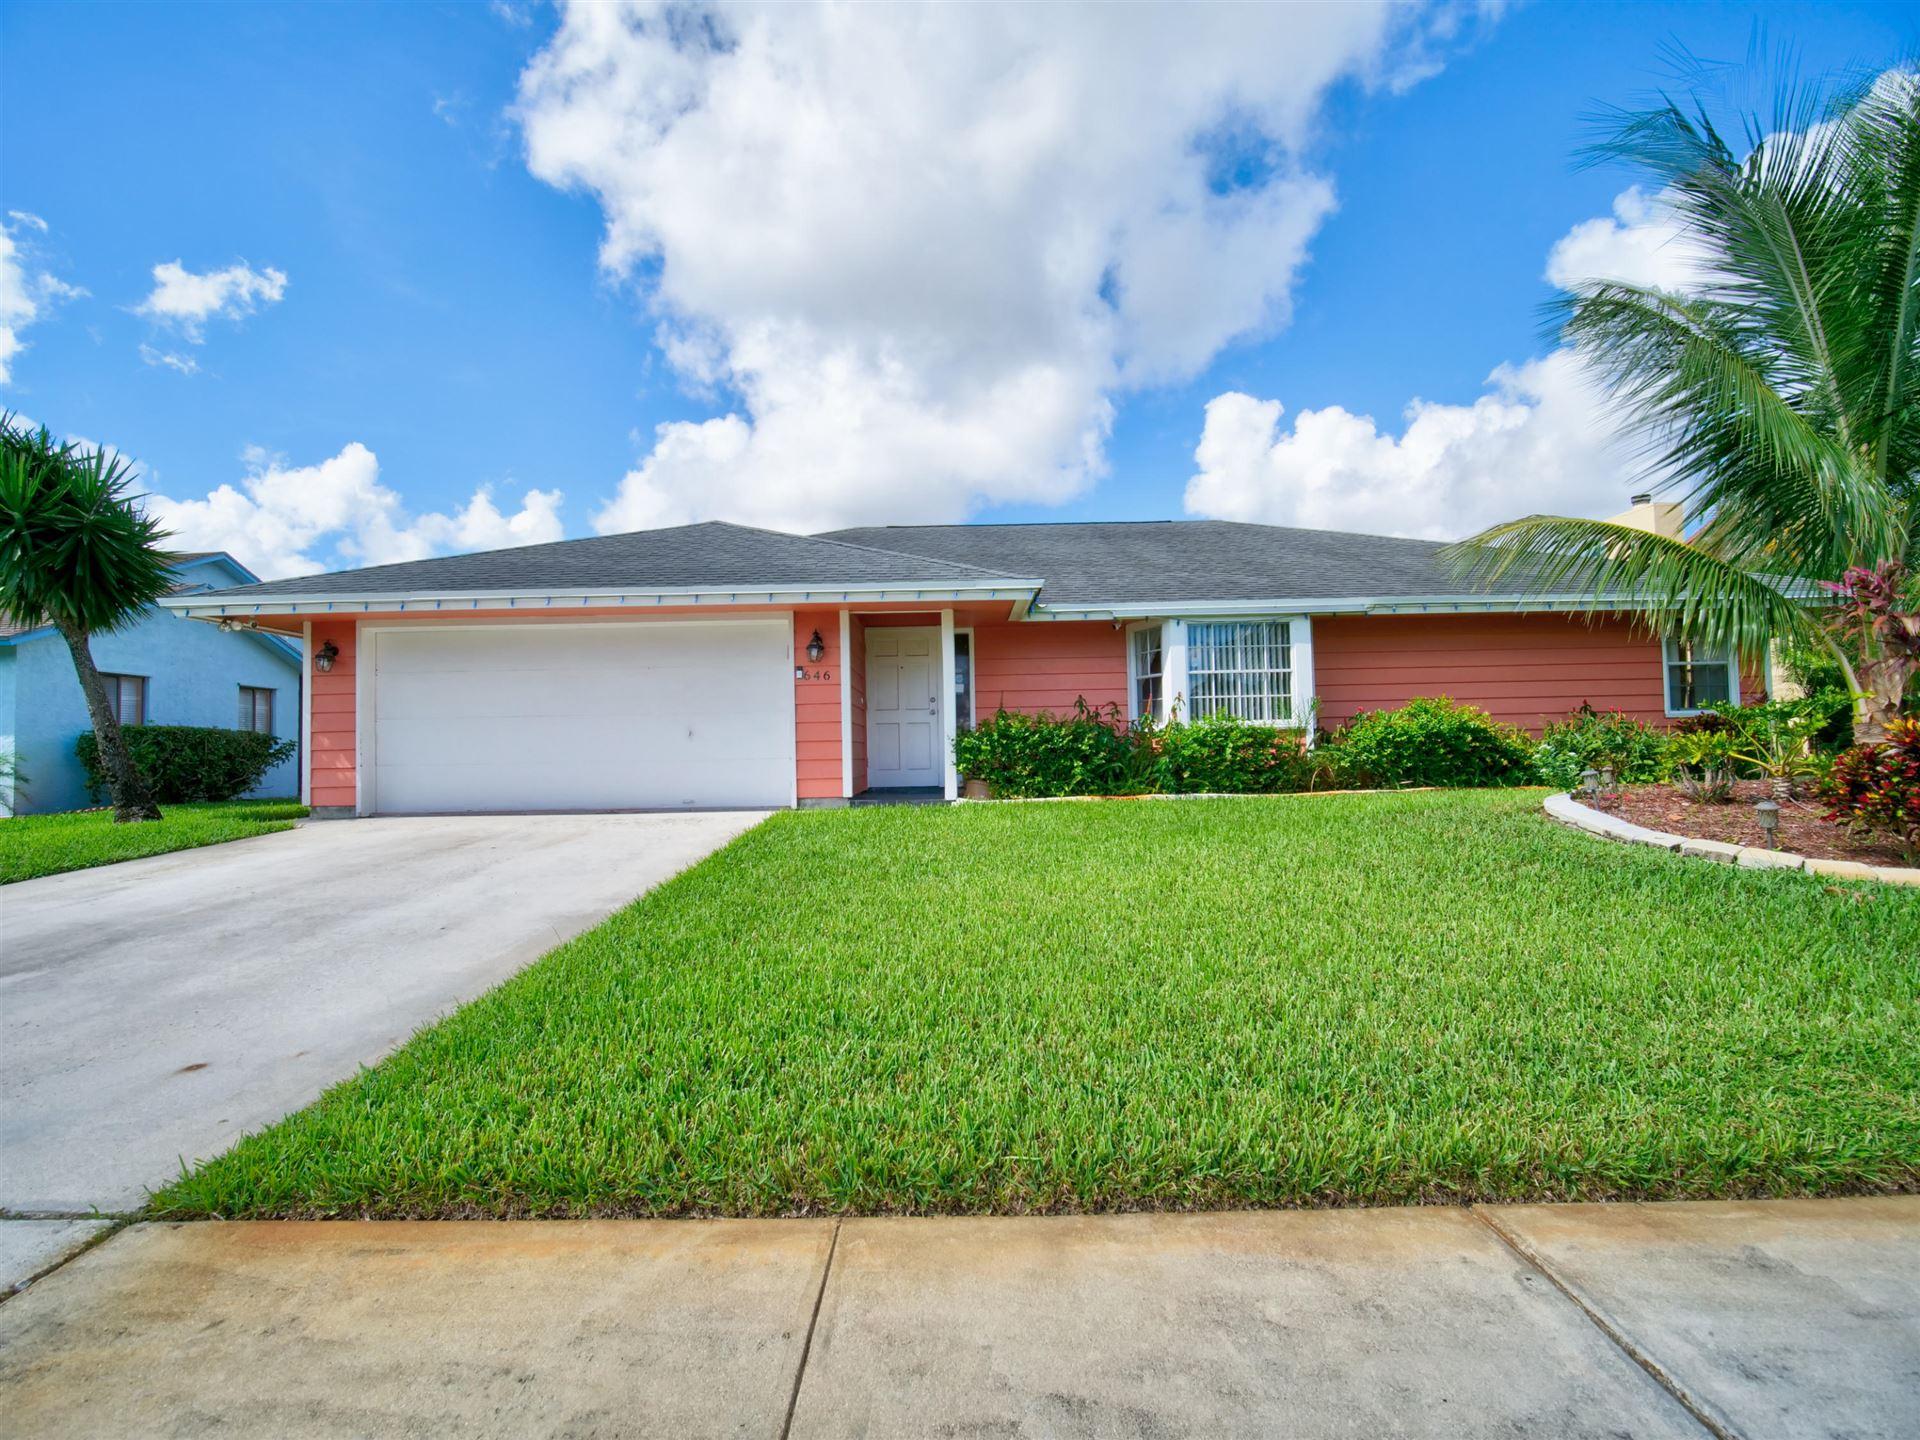 646 White Water Drive, West Palm Beach, FL 33413 - MLS#: RX-10741900